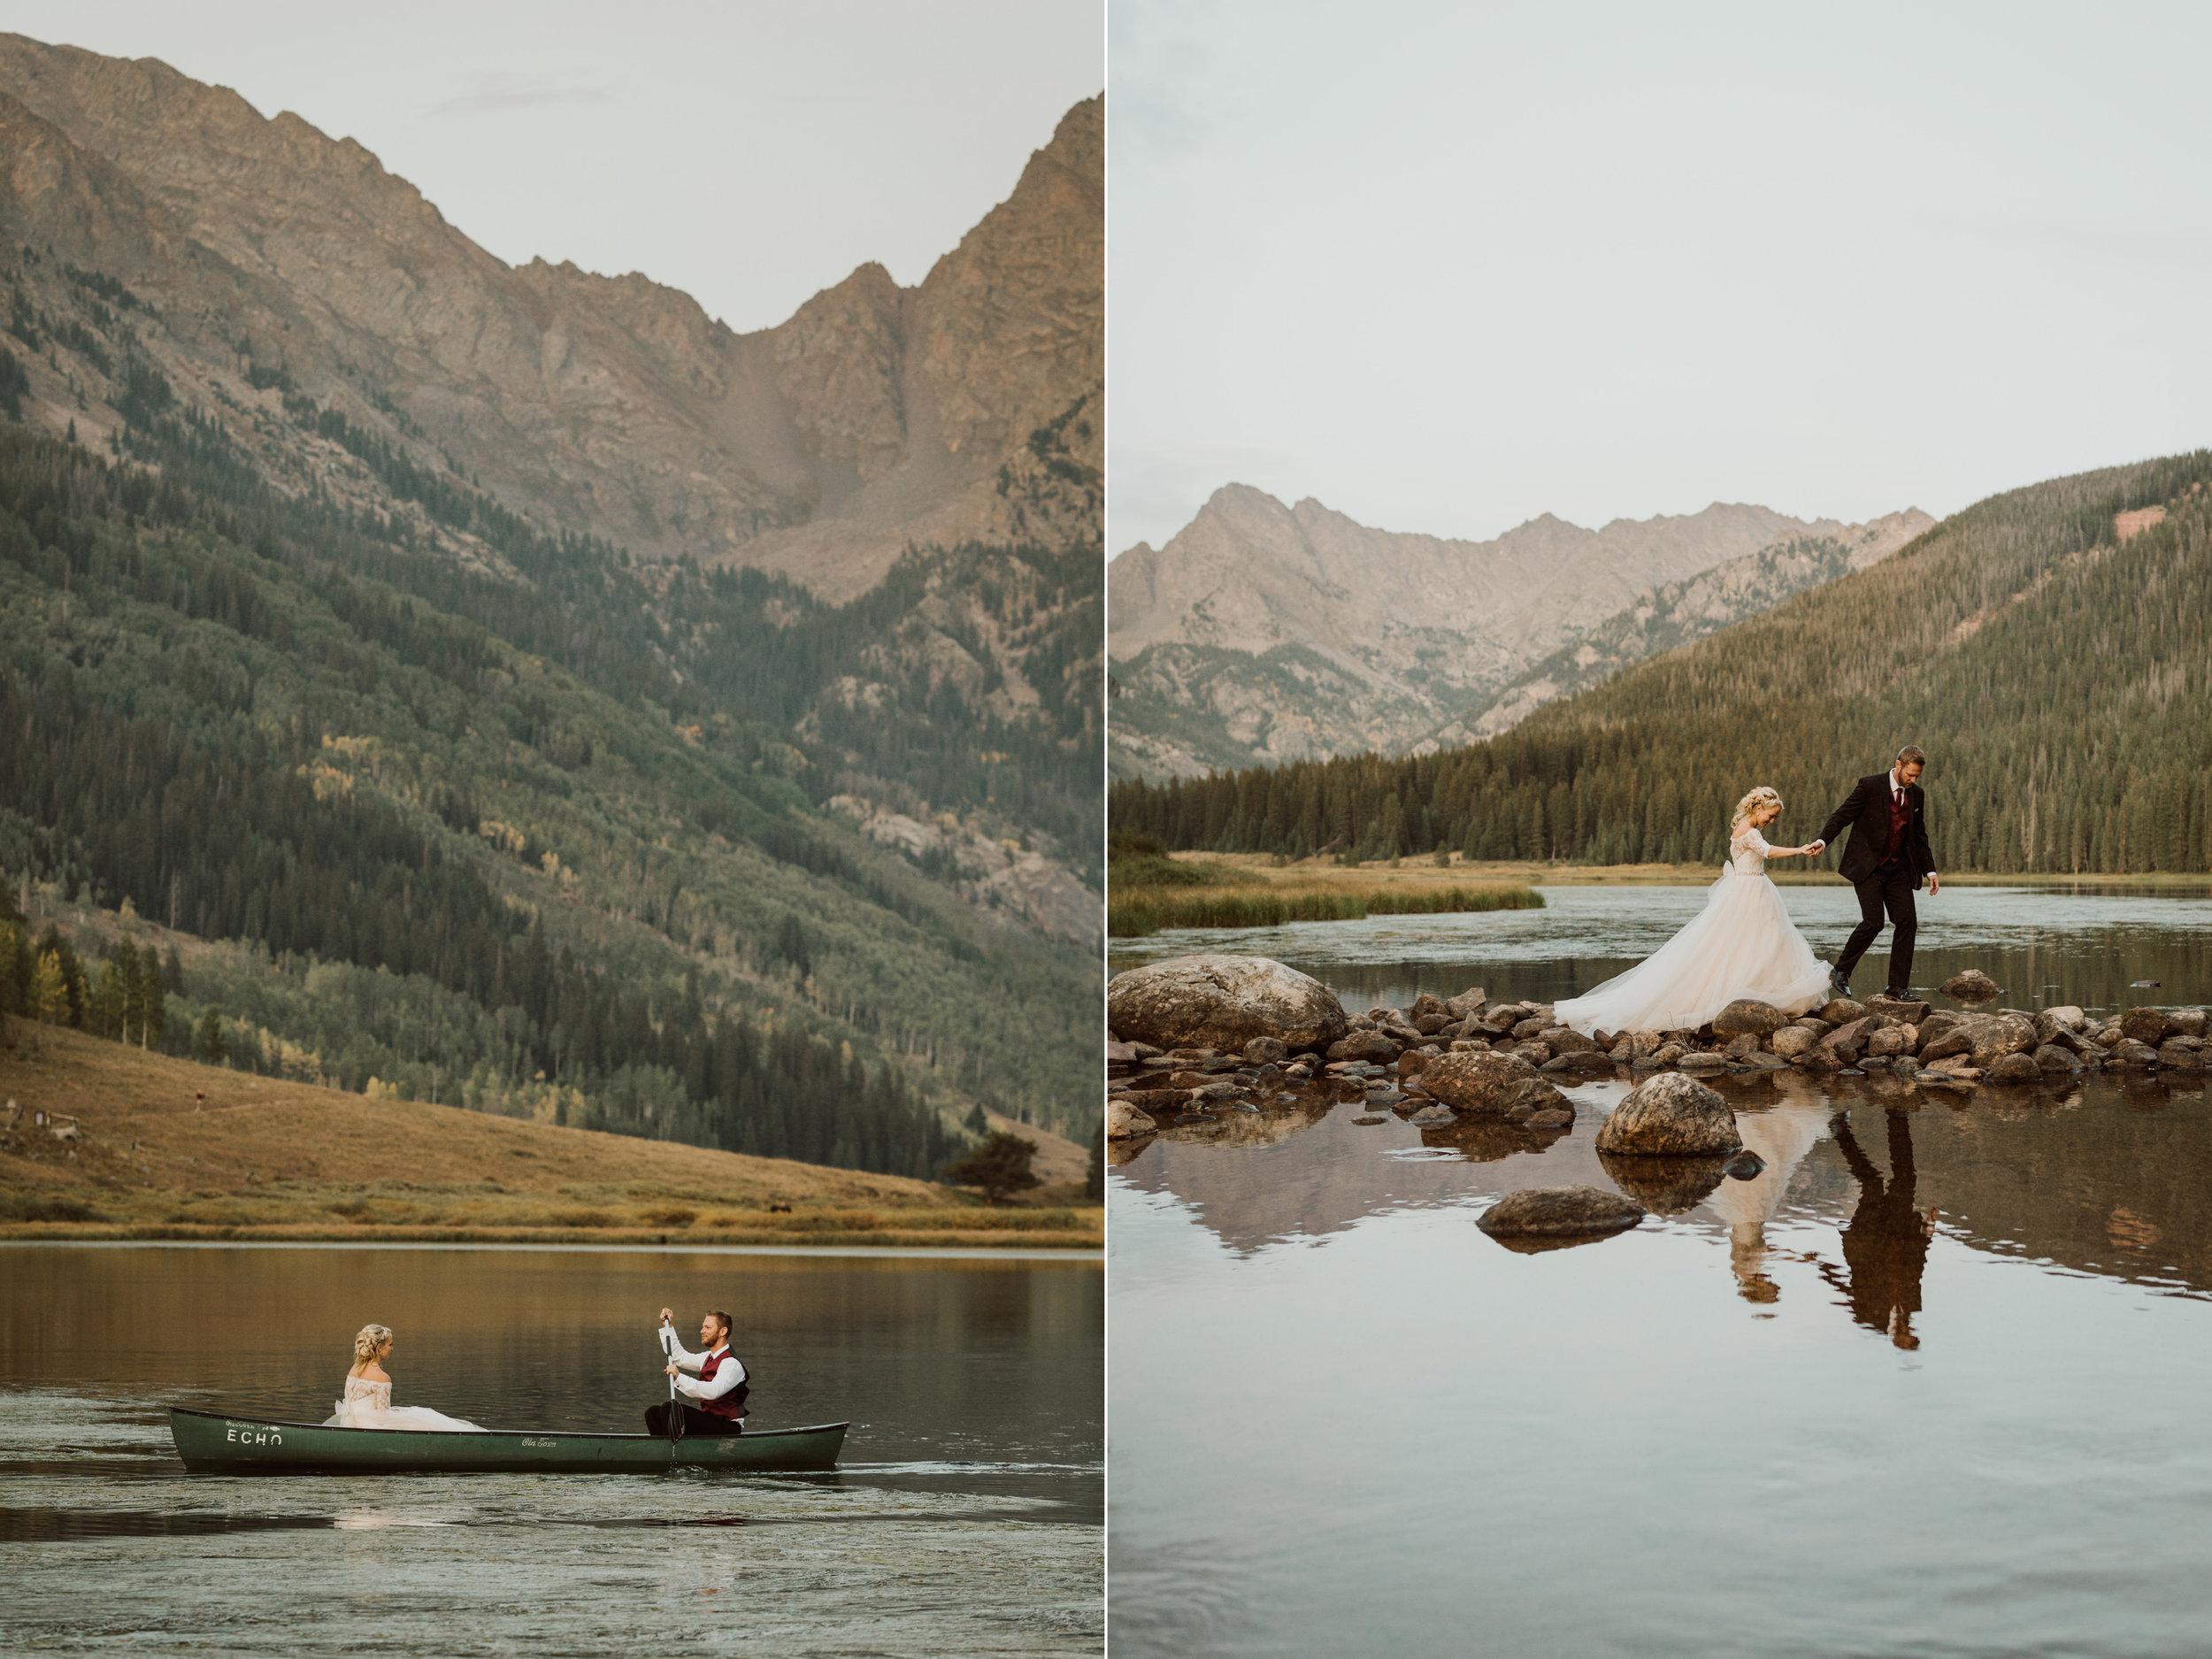 17-9-adventure-wedding-photographer-30.jpg